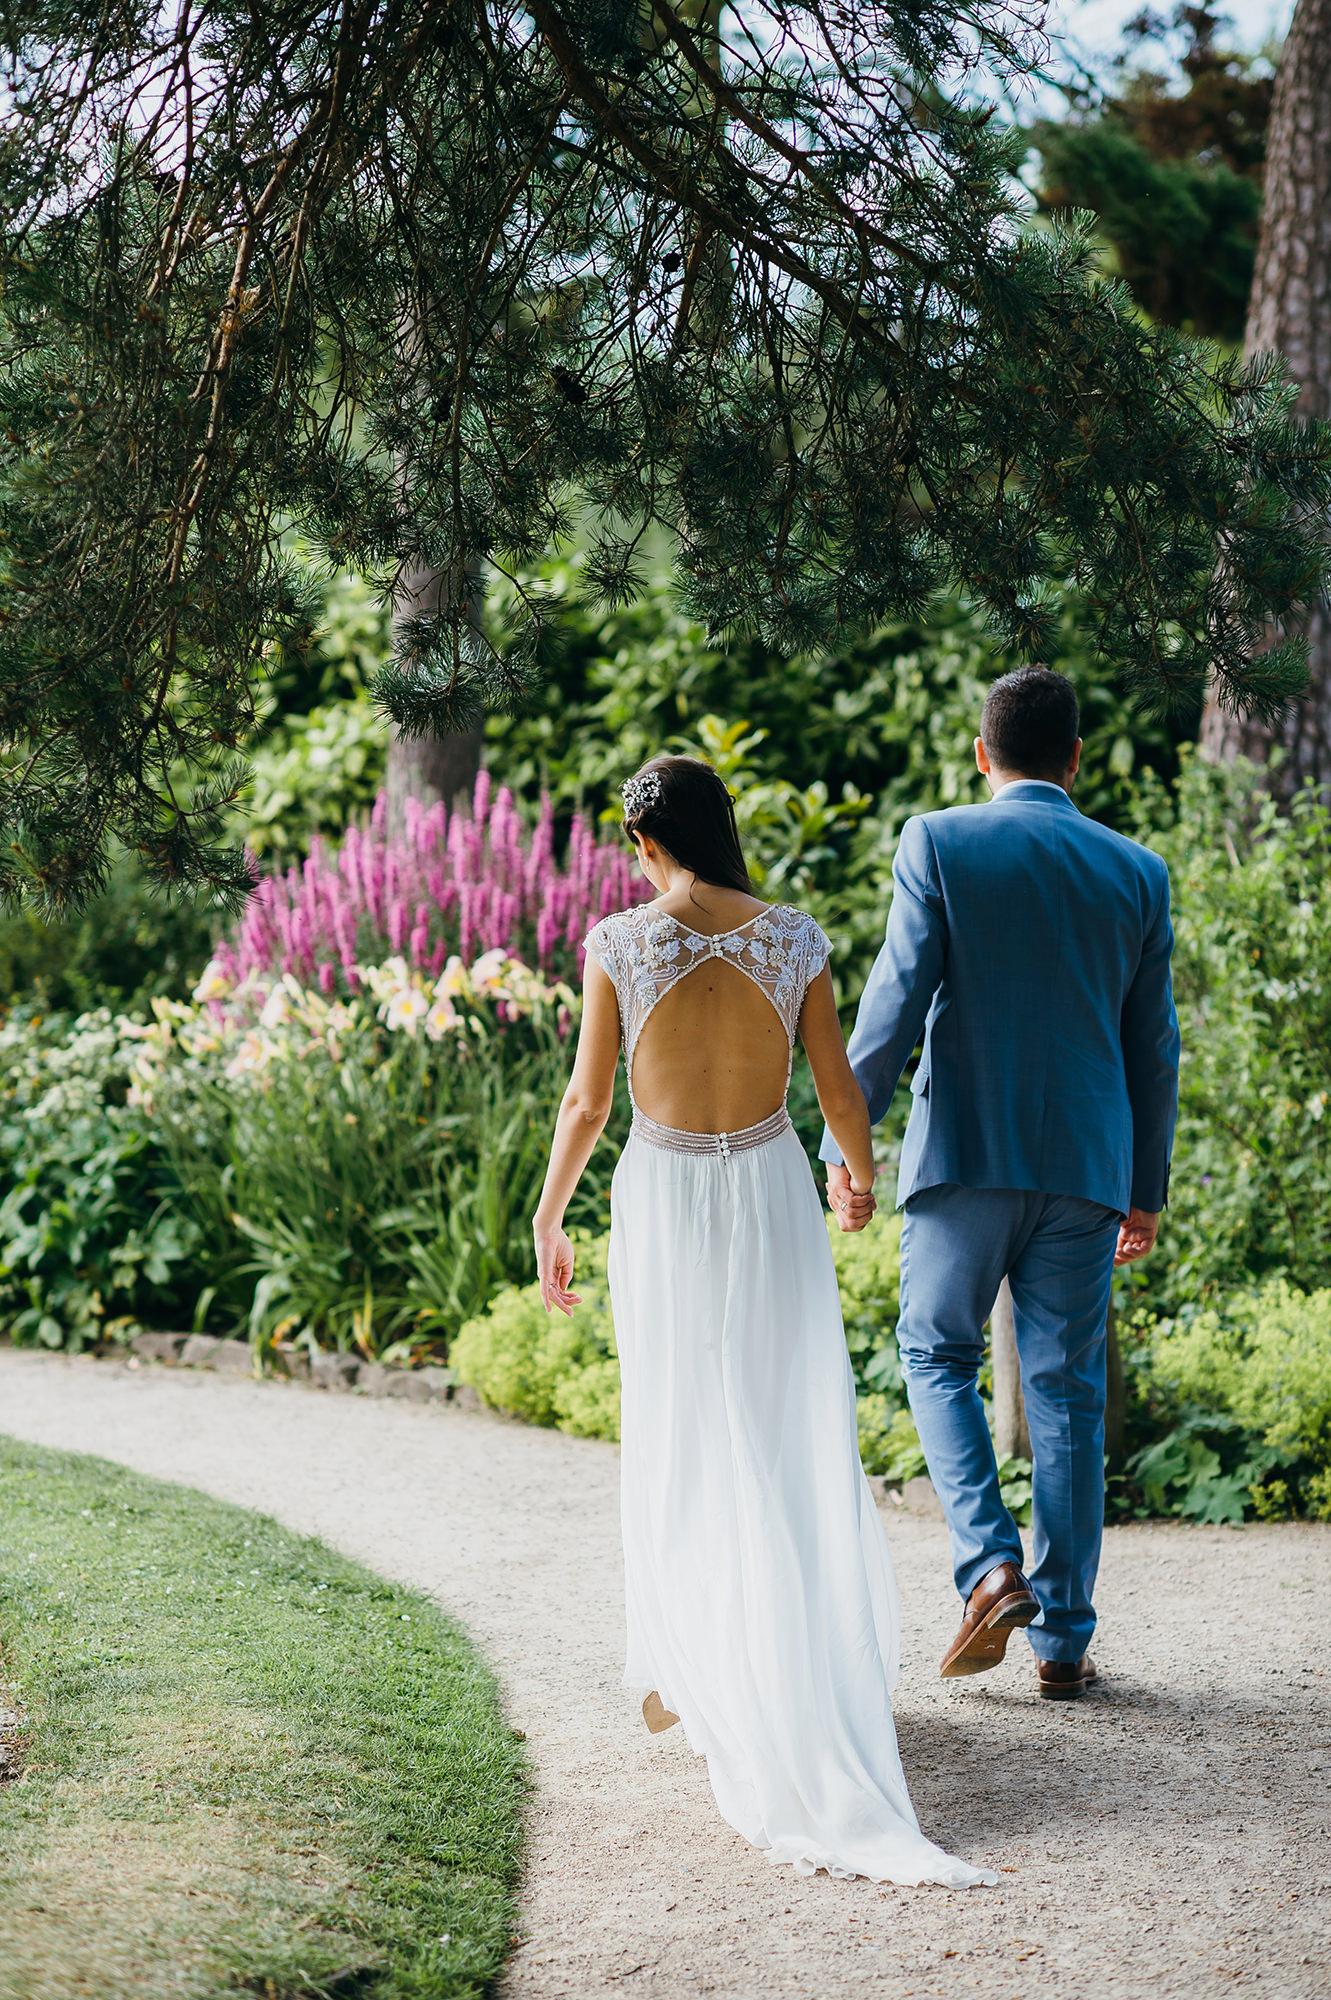 Open back on wedding dress